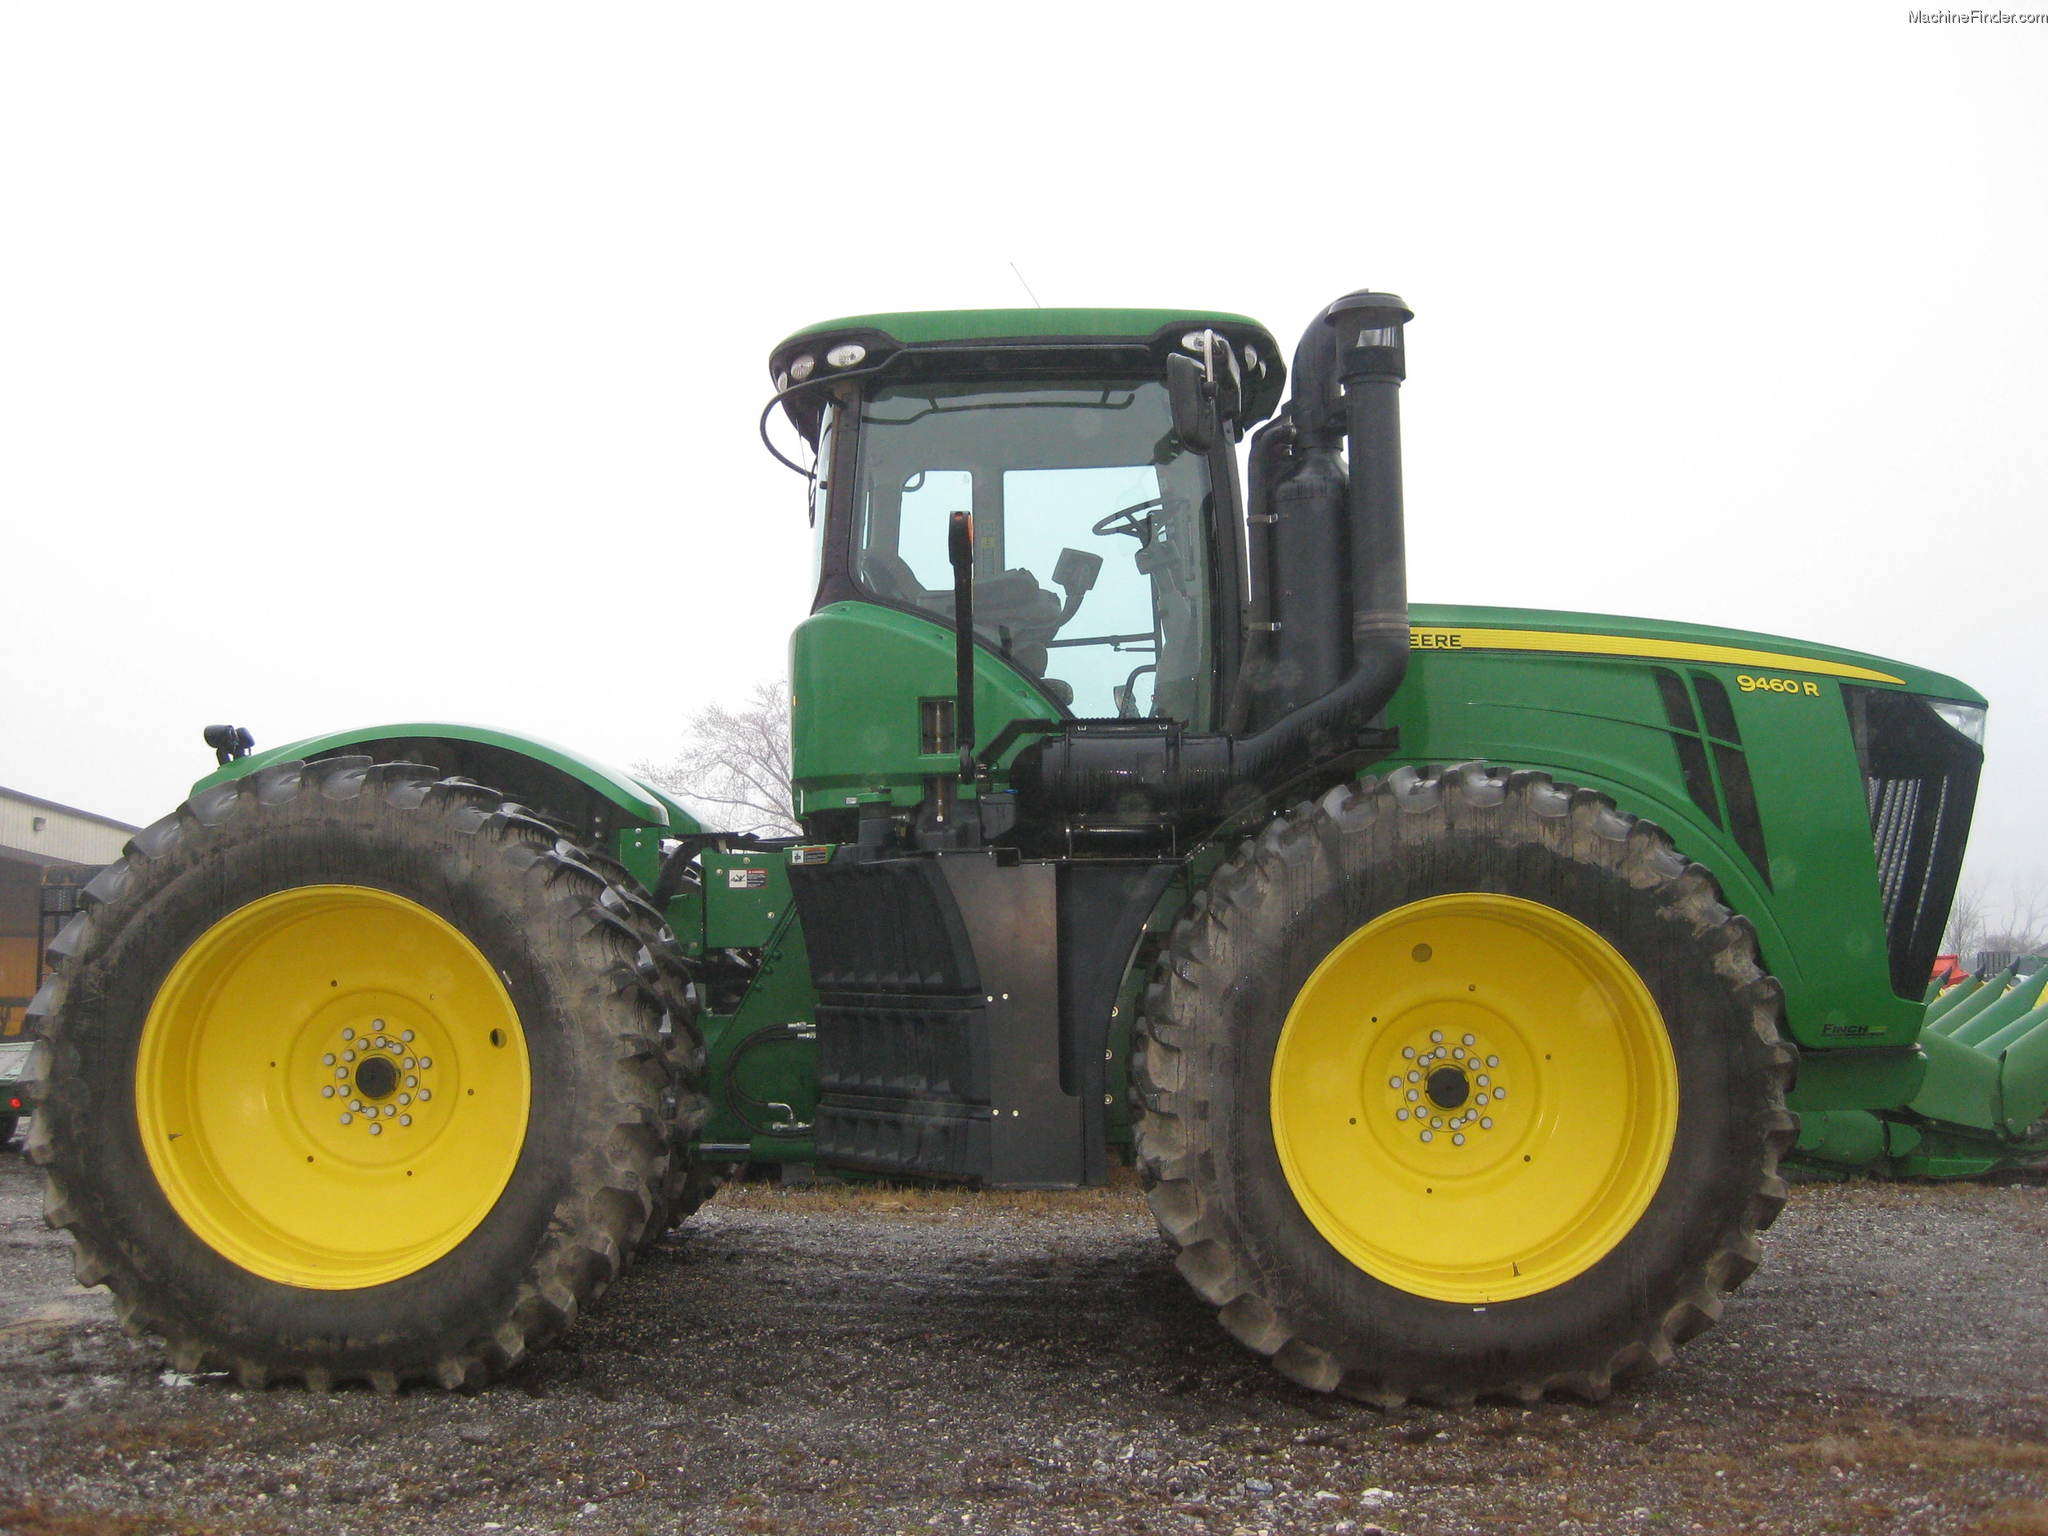 2012 John Deere 9460R Tractors - Articulated 4WD - John ...